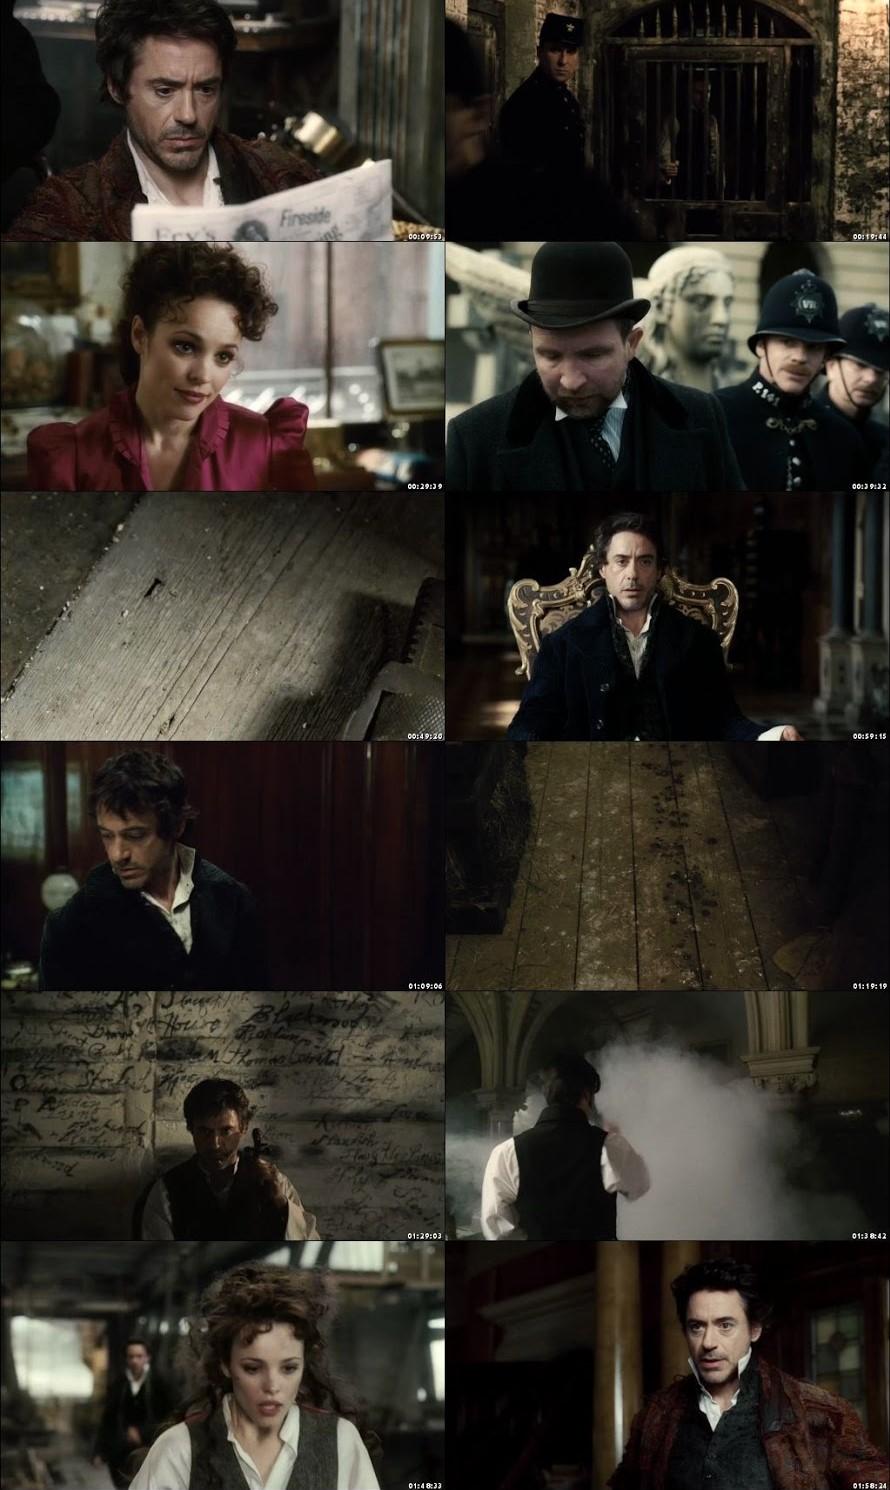 Sherlock Holmes 2009 Full Movie Online Watch